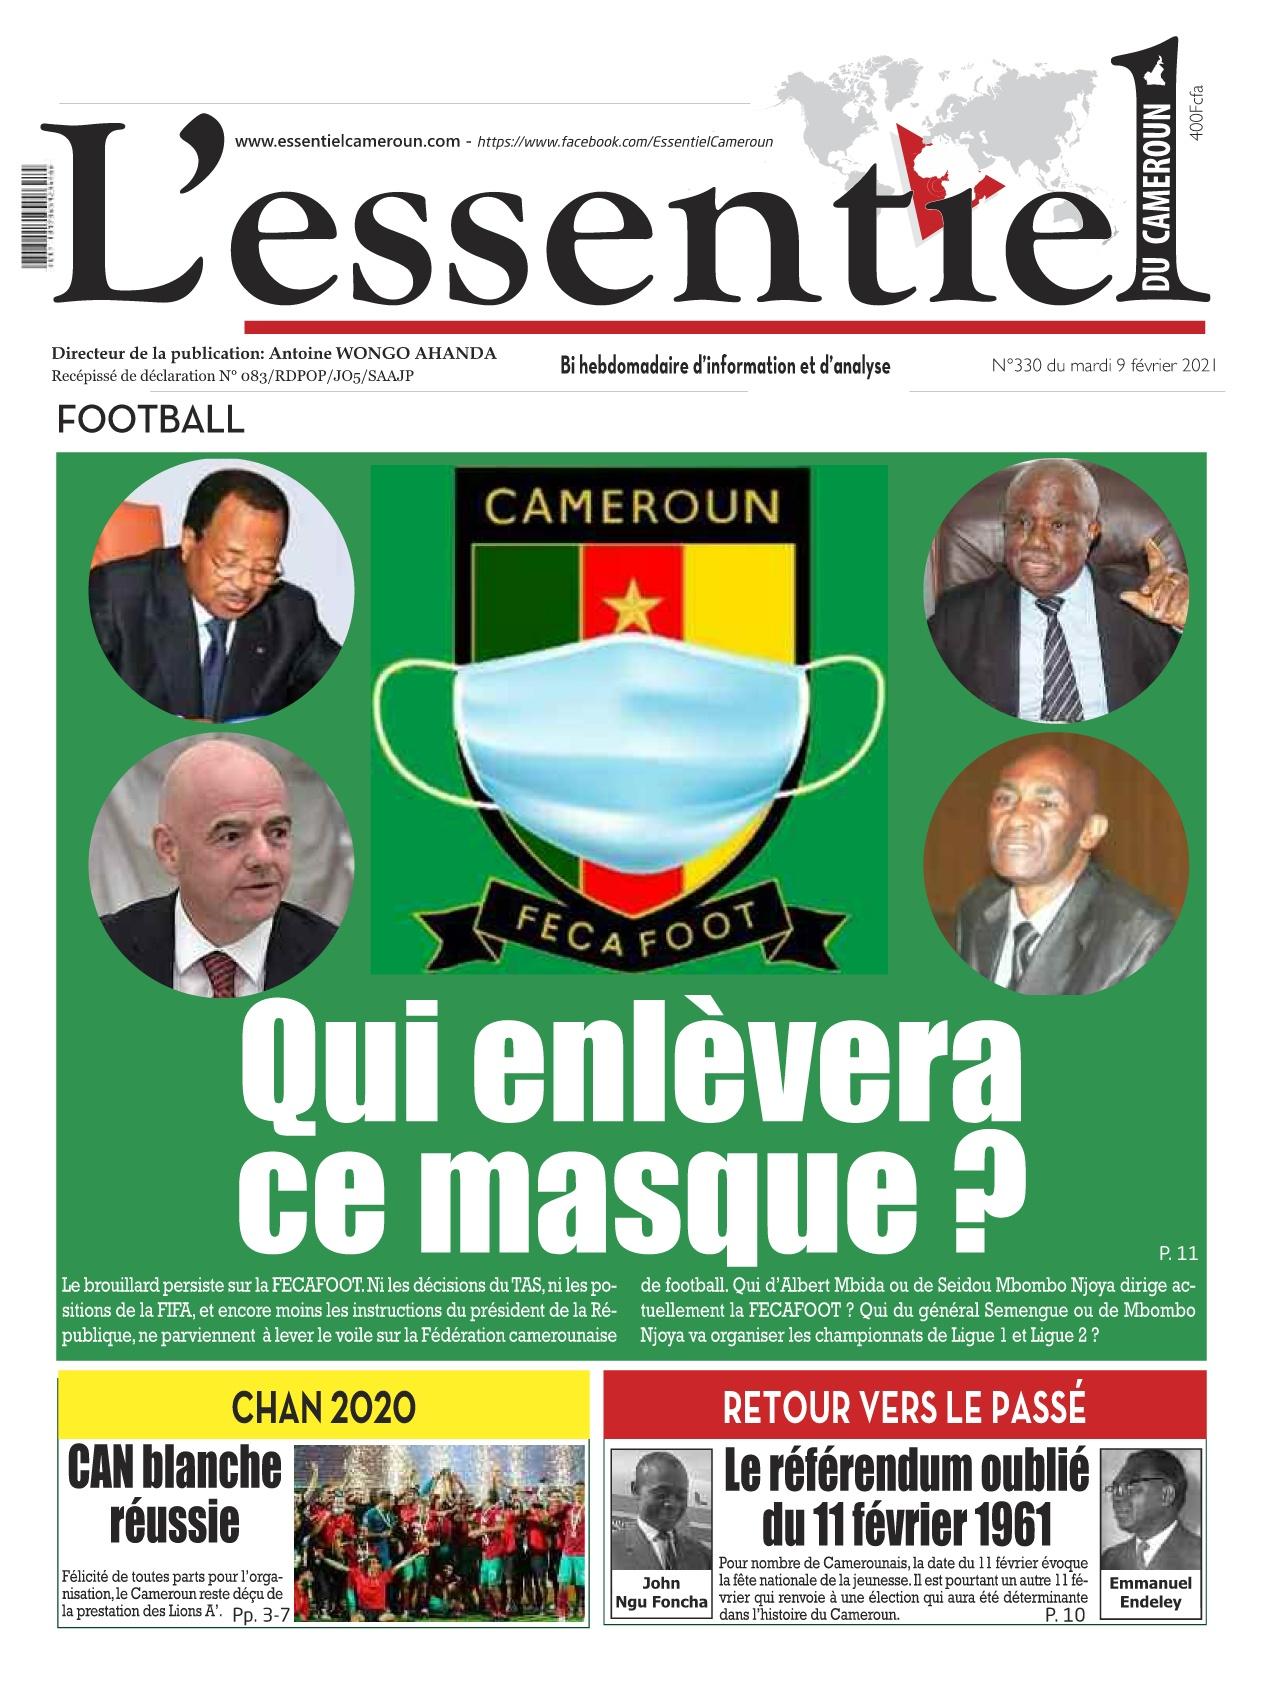 L'essentiel du Cameroun - 09/02/2021